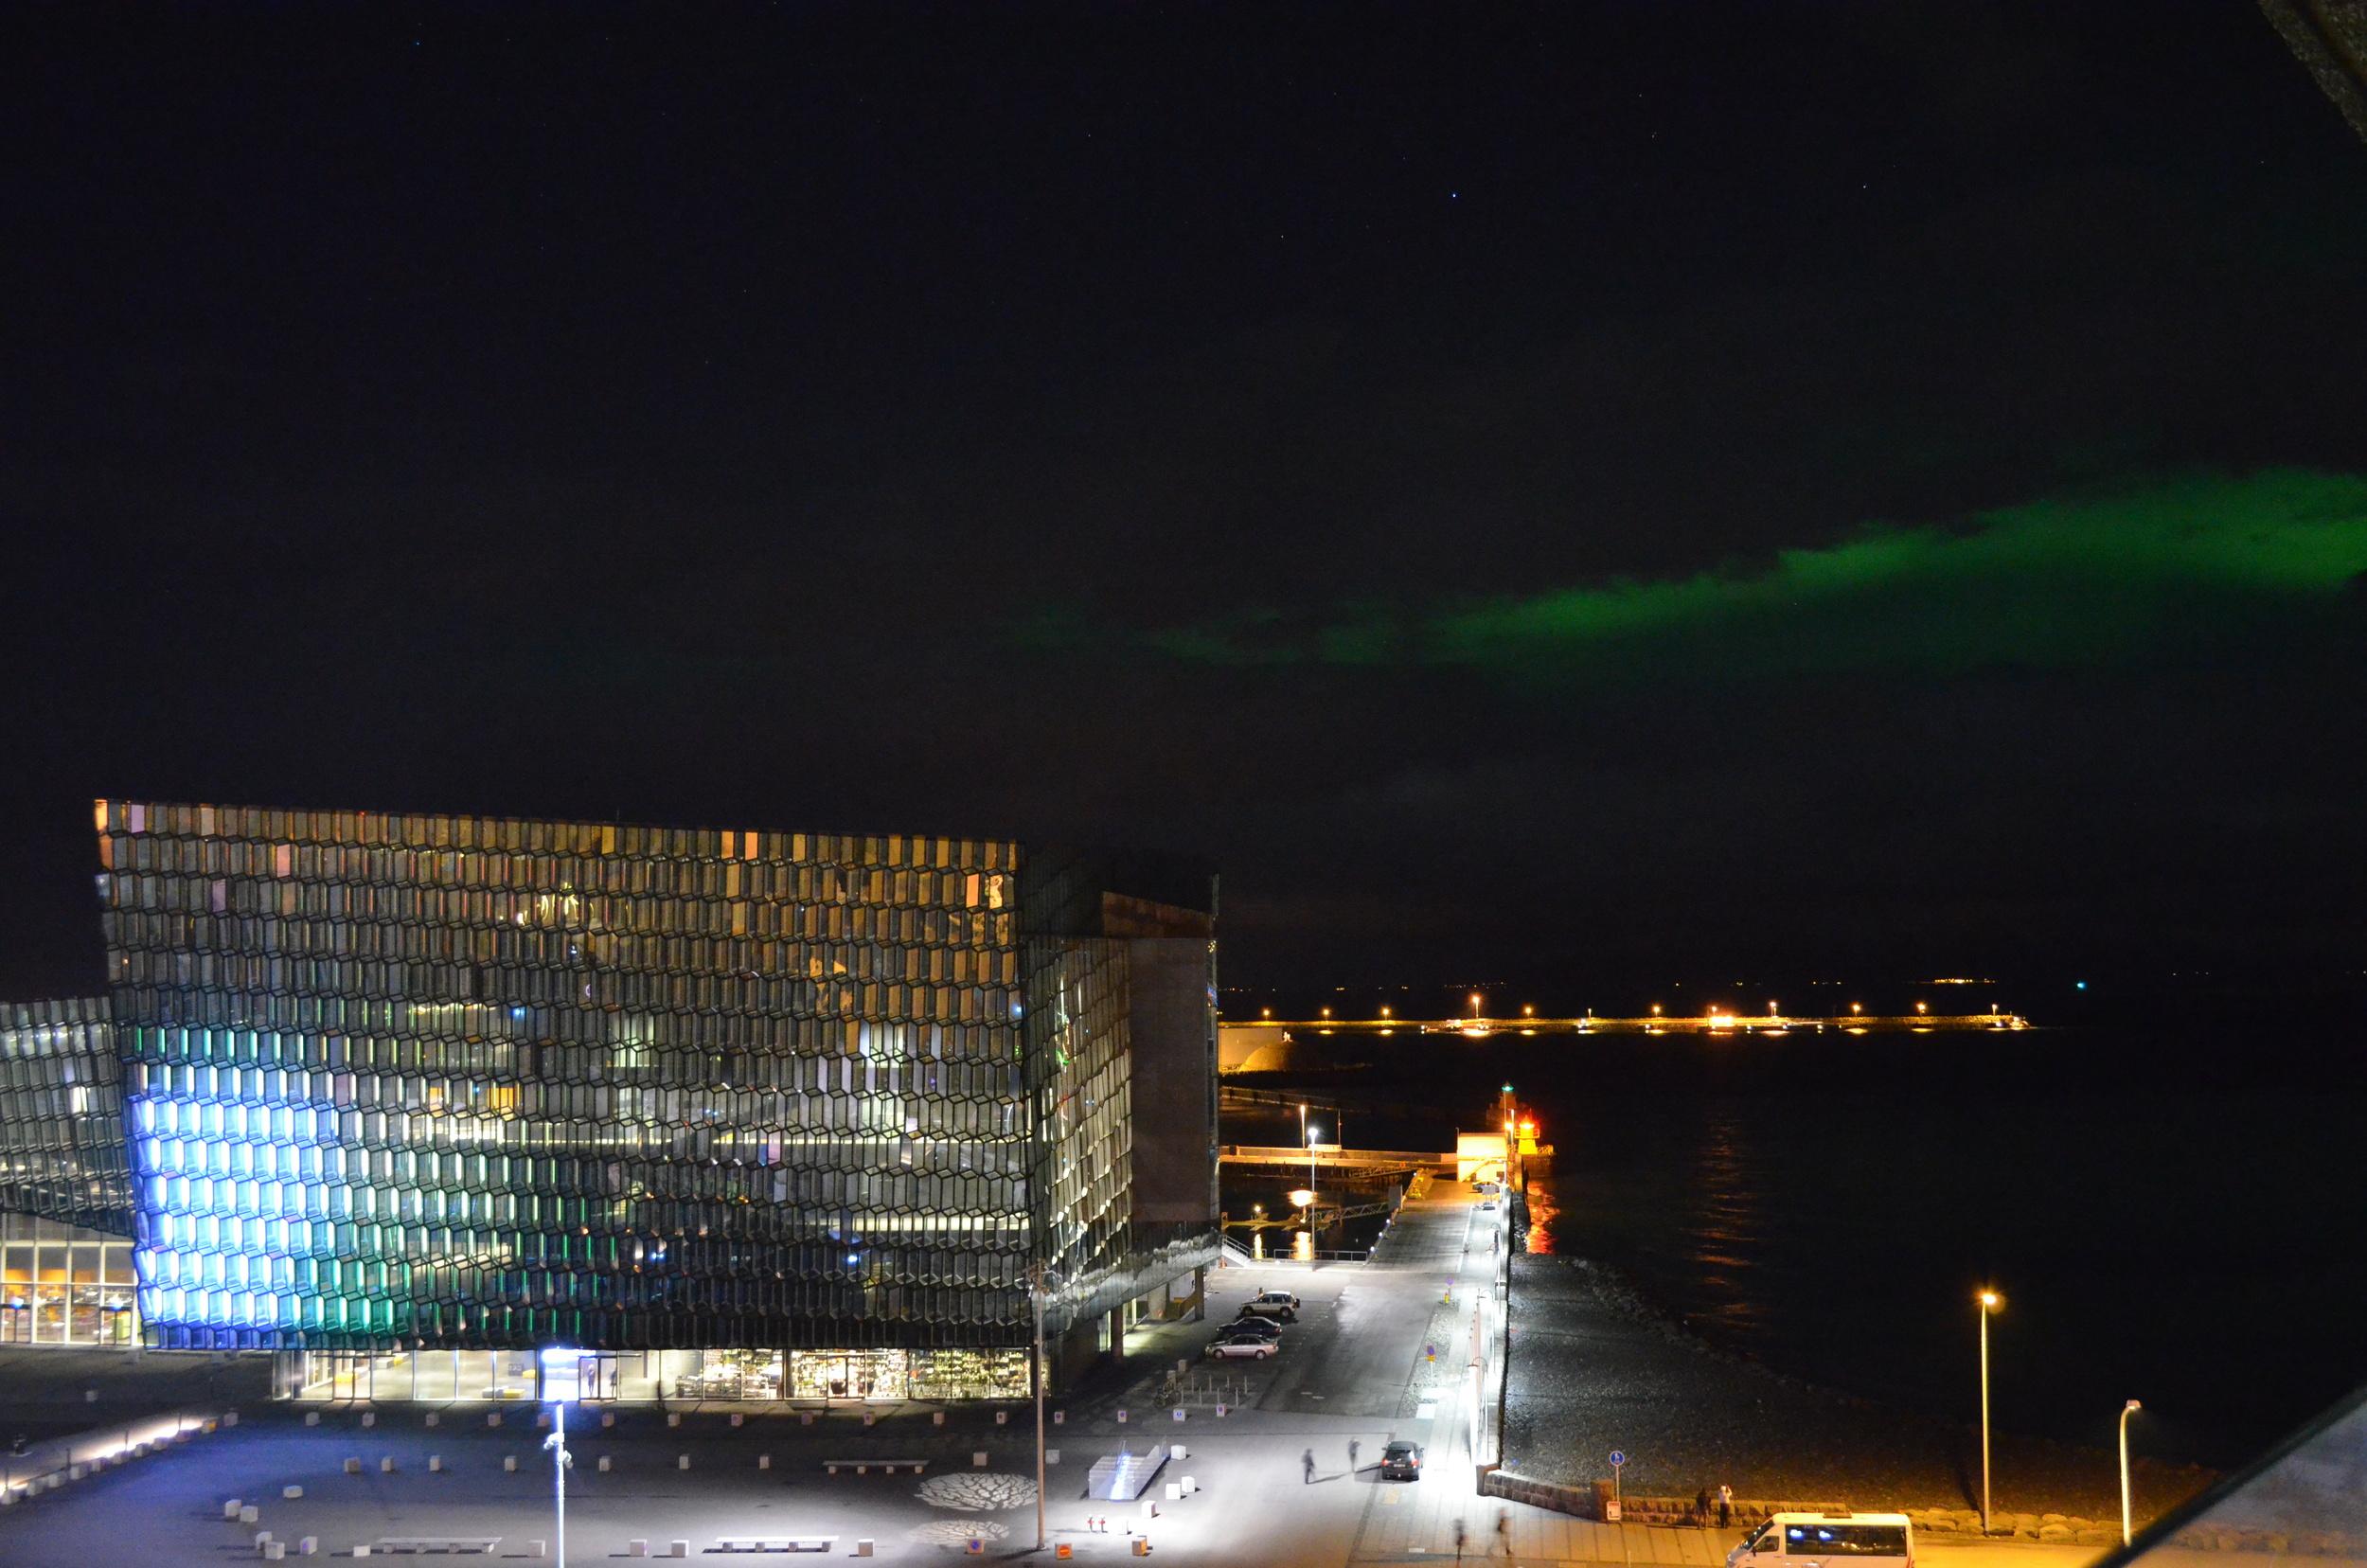 The Northern Lights dance past the Harpa Concert Hall in Reykjavík